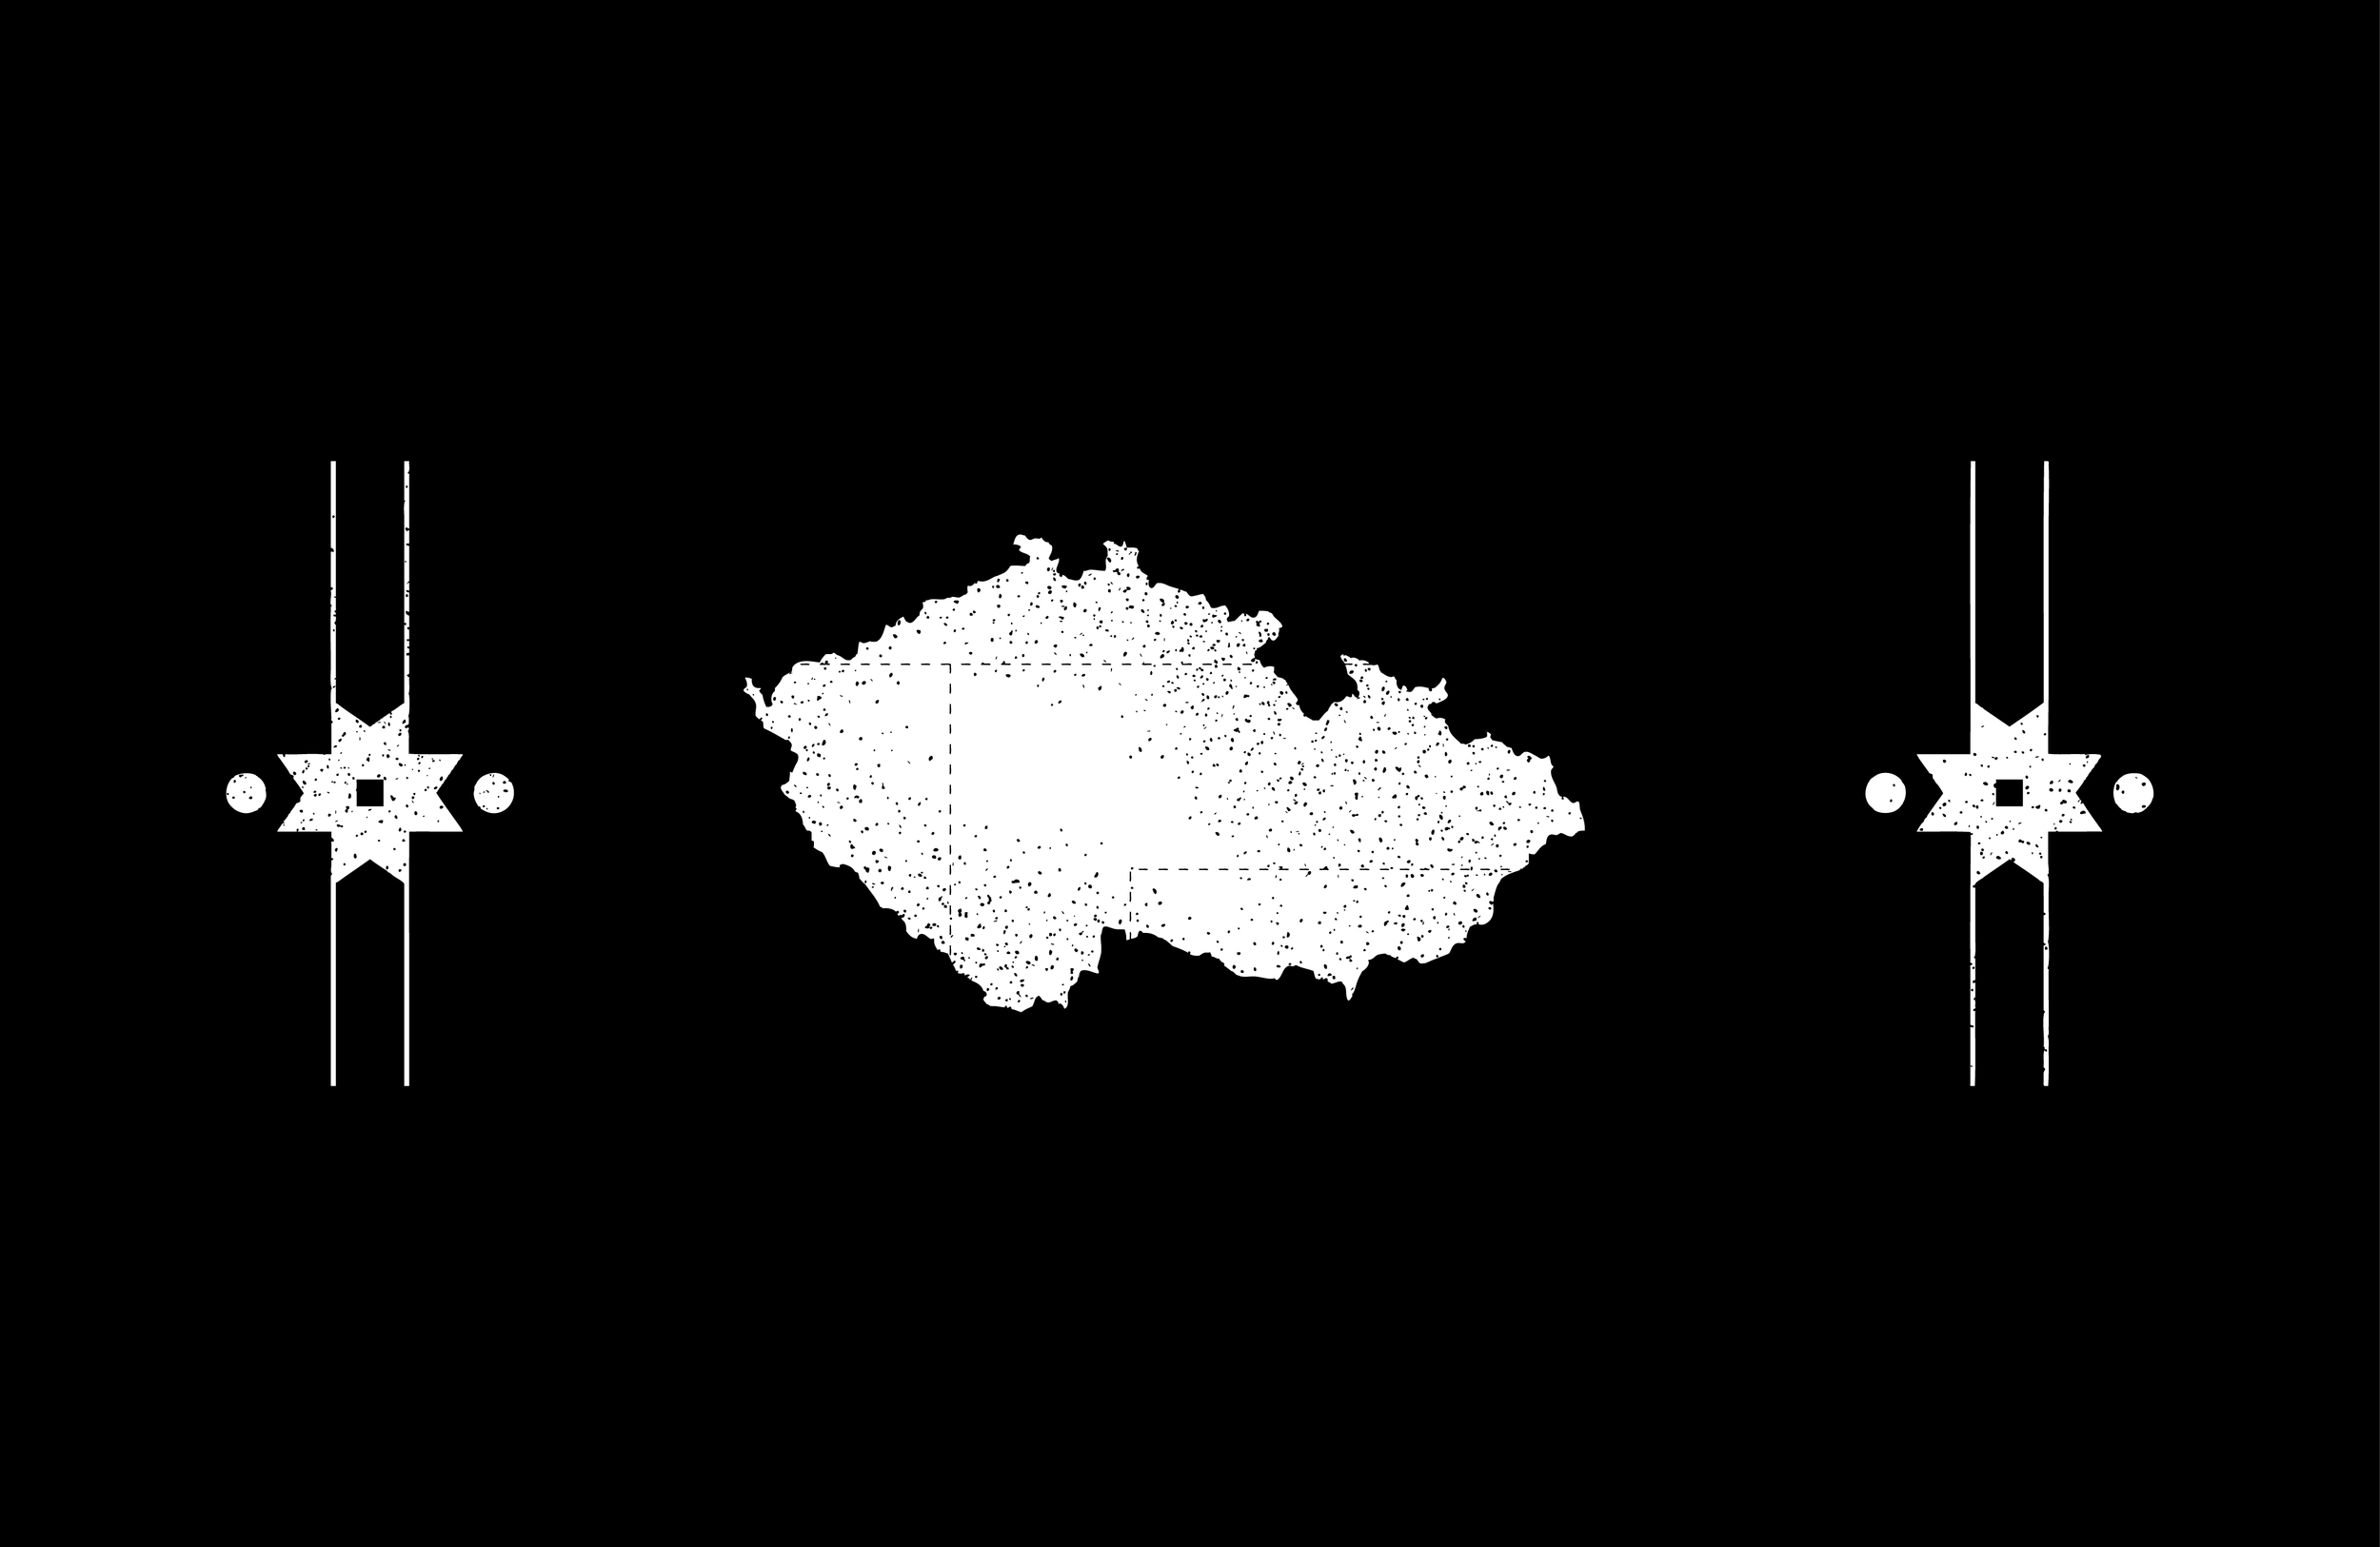 Drak-Syry-03.jpg